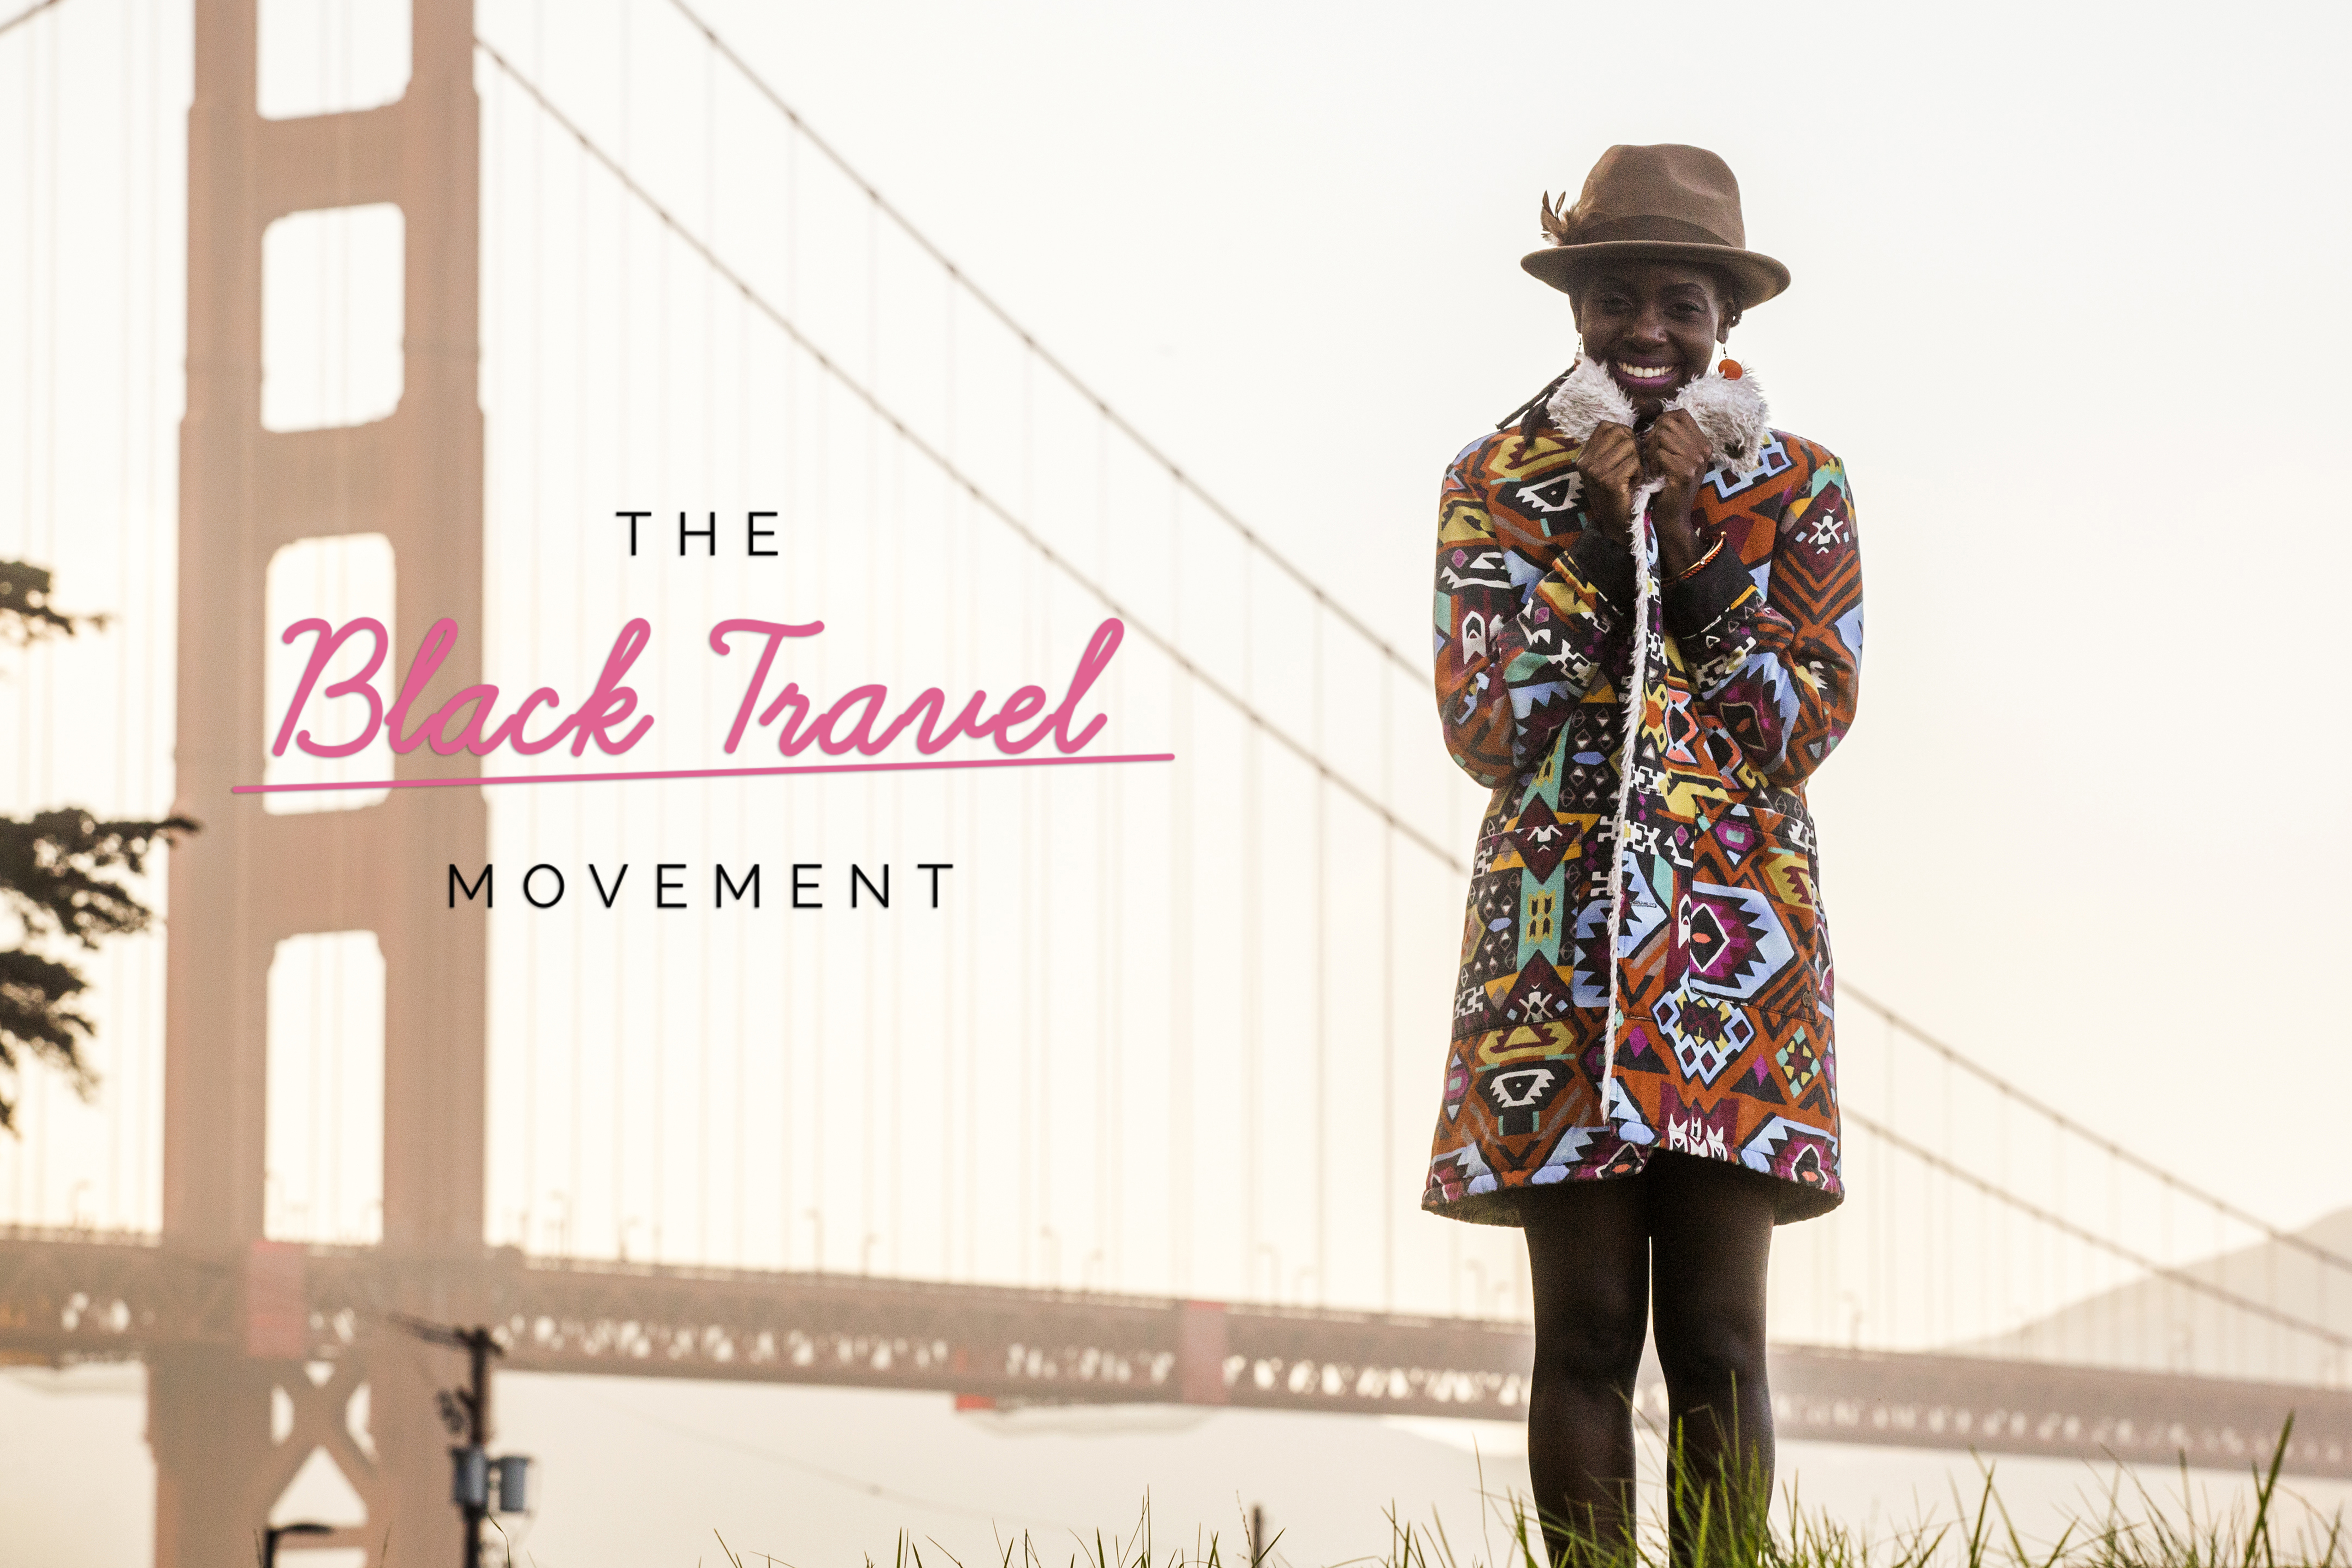 Black woman wearing colorful coat by Golden Gate Bridge, San Francisco, California, United States